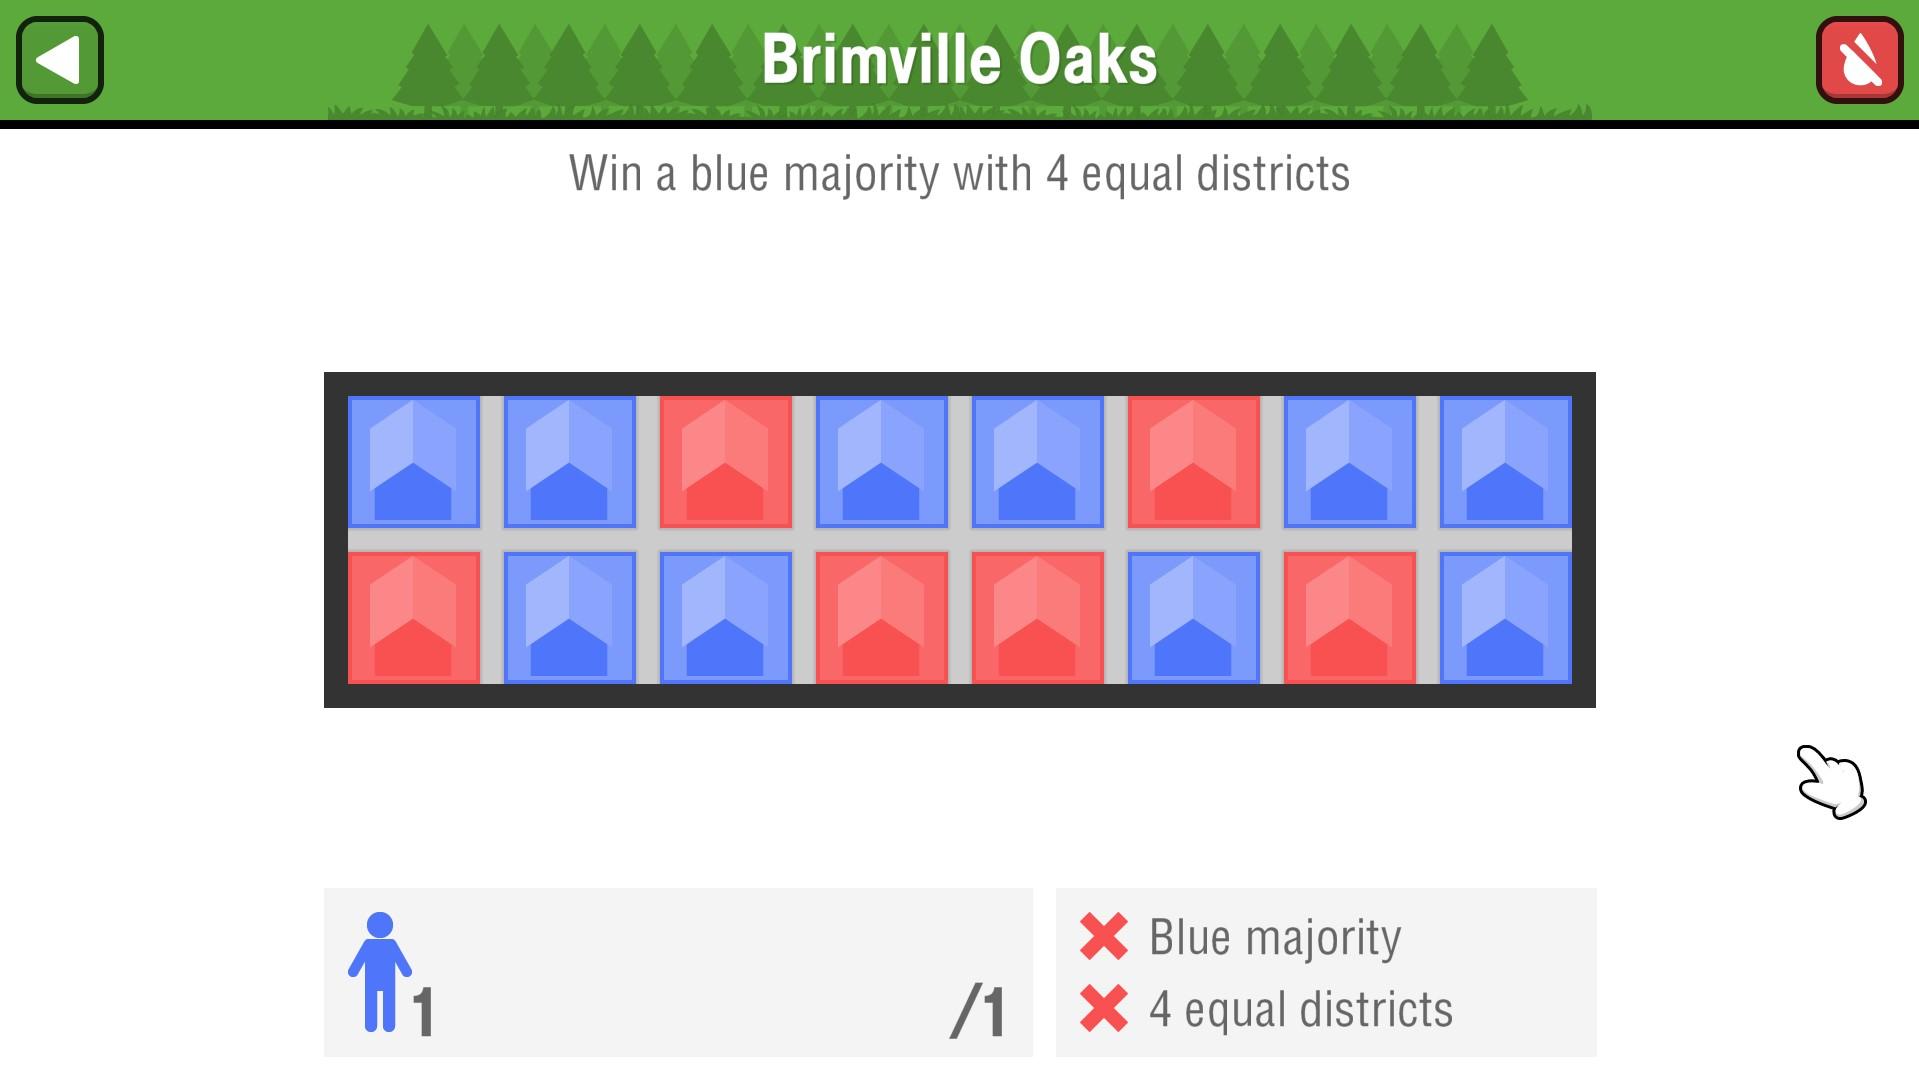 Brimville Oaks